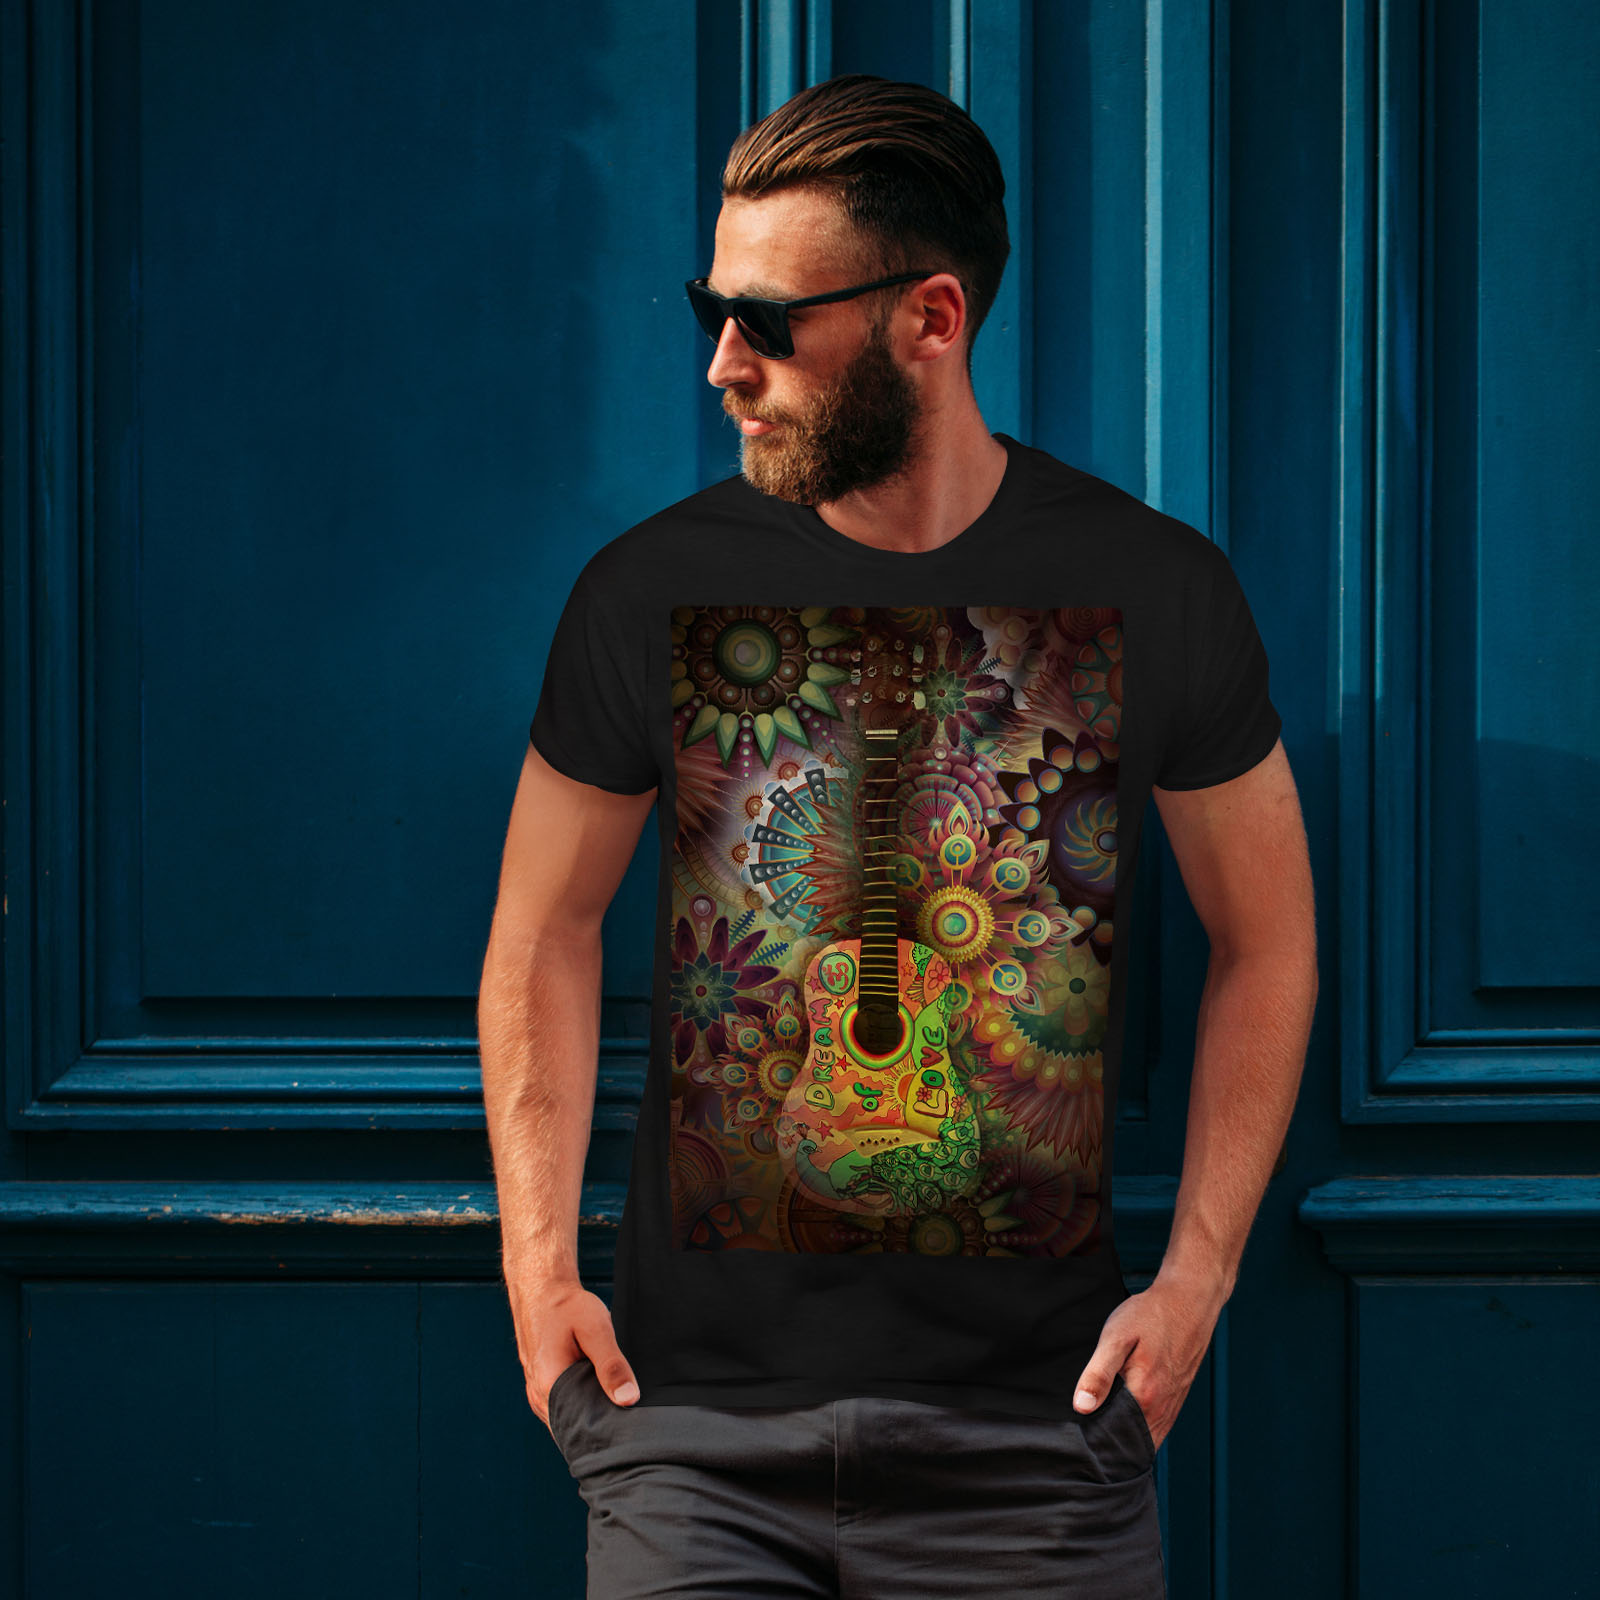 Wellcoda-Colorful-Guitar-Mens-T-shirt-Music-Graphic-Design-Printed-Tee thumbnail 4